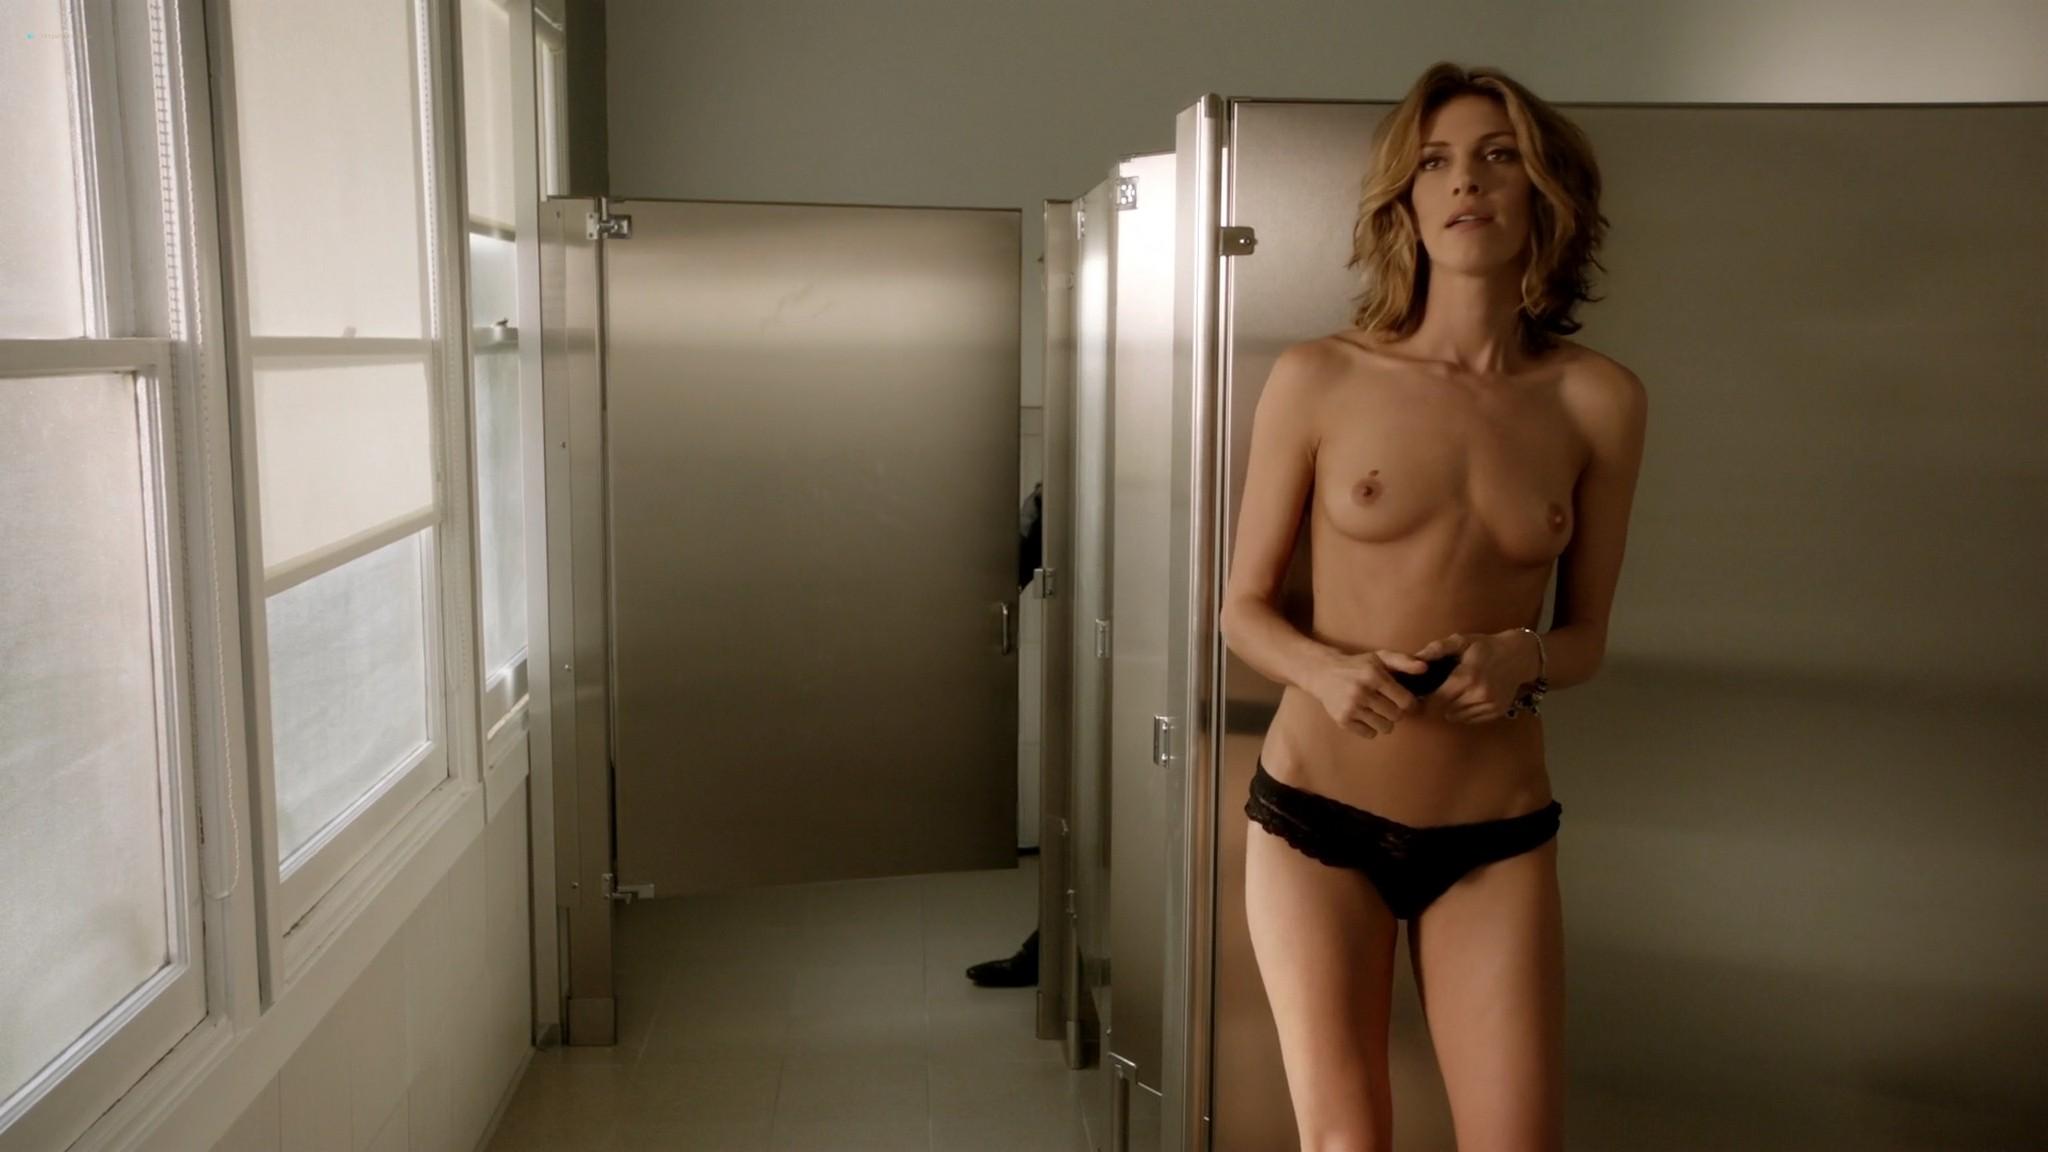 Megalyn Echikunwoke nude topless and Dawn Olivieri nude too House of Lies 2012 s1e7 1080p Web 10